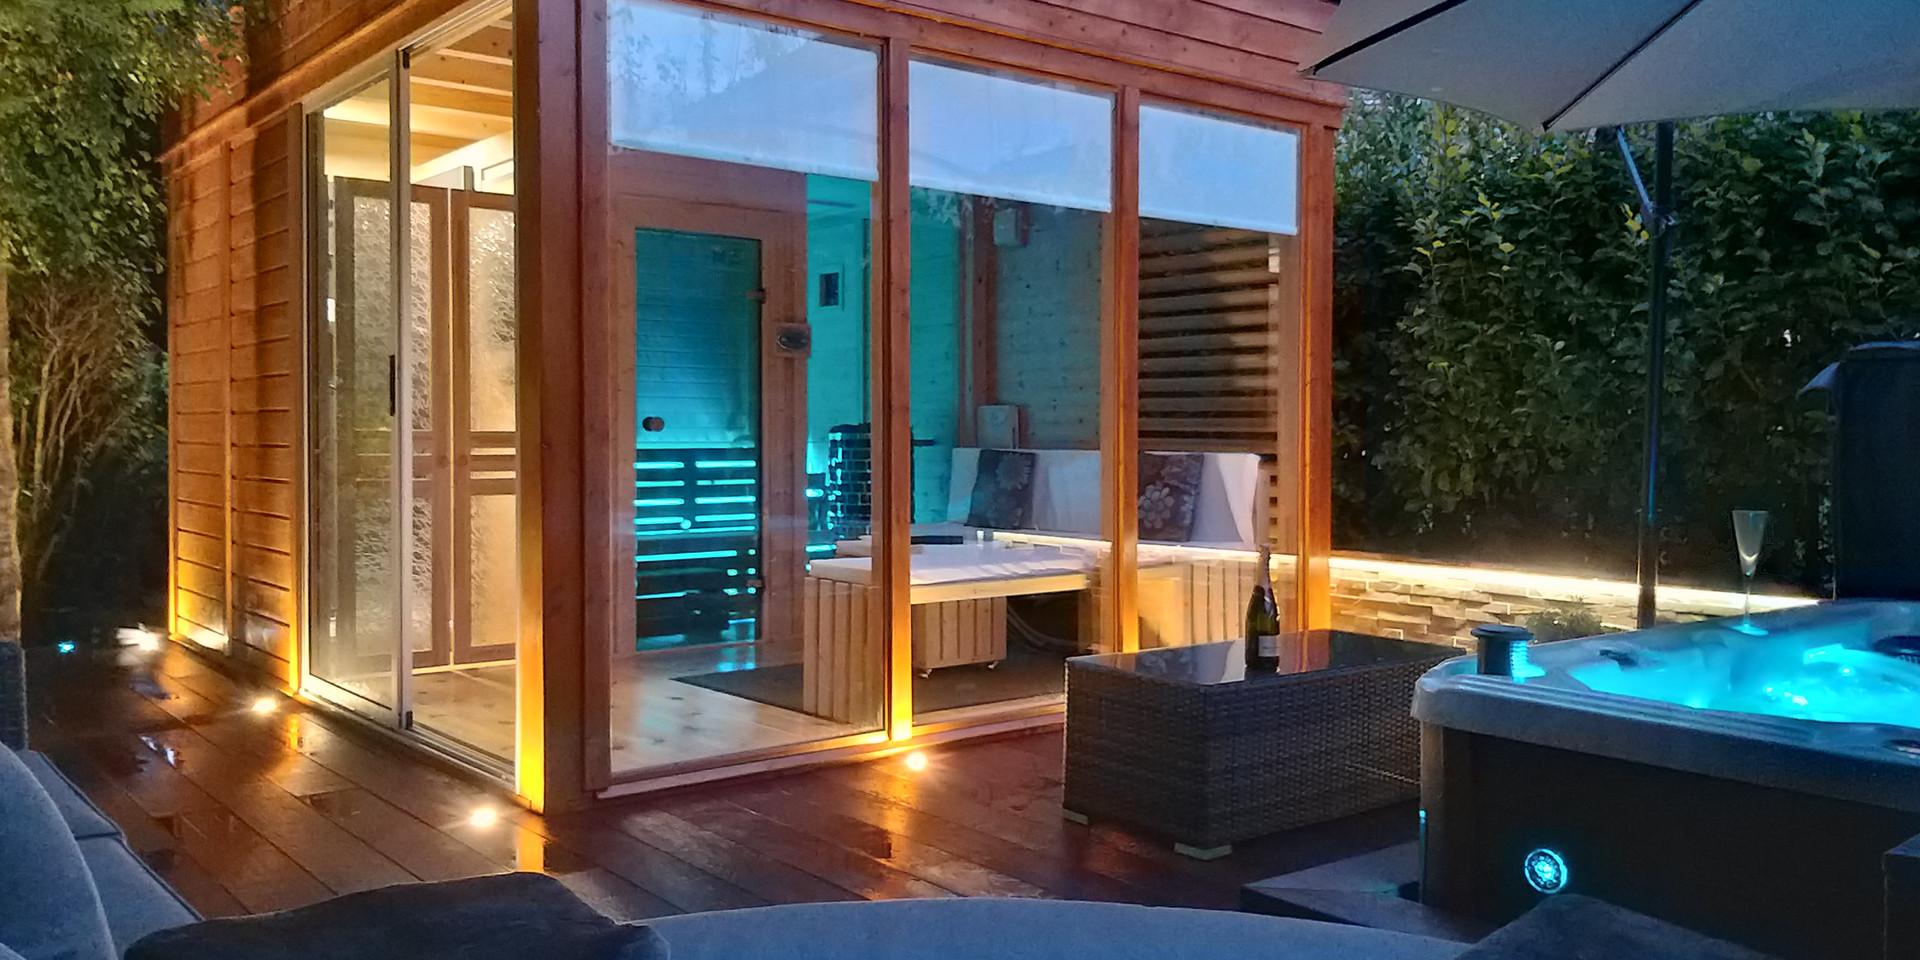 Hillingford's garden sauna and spa